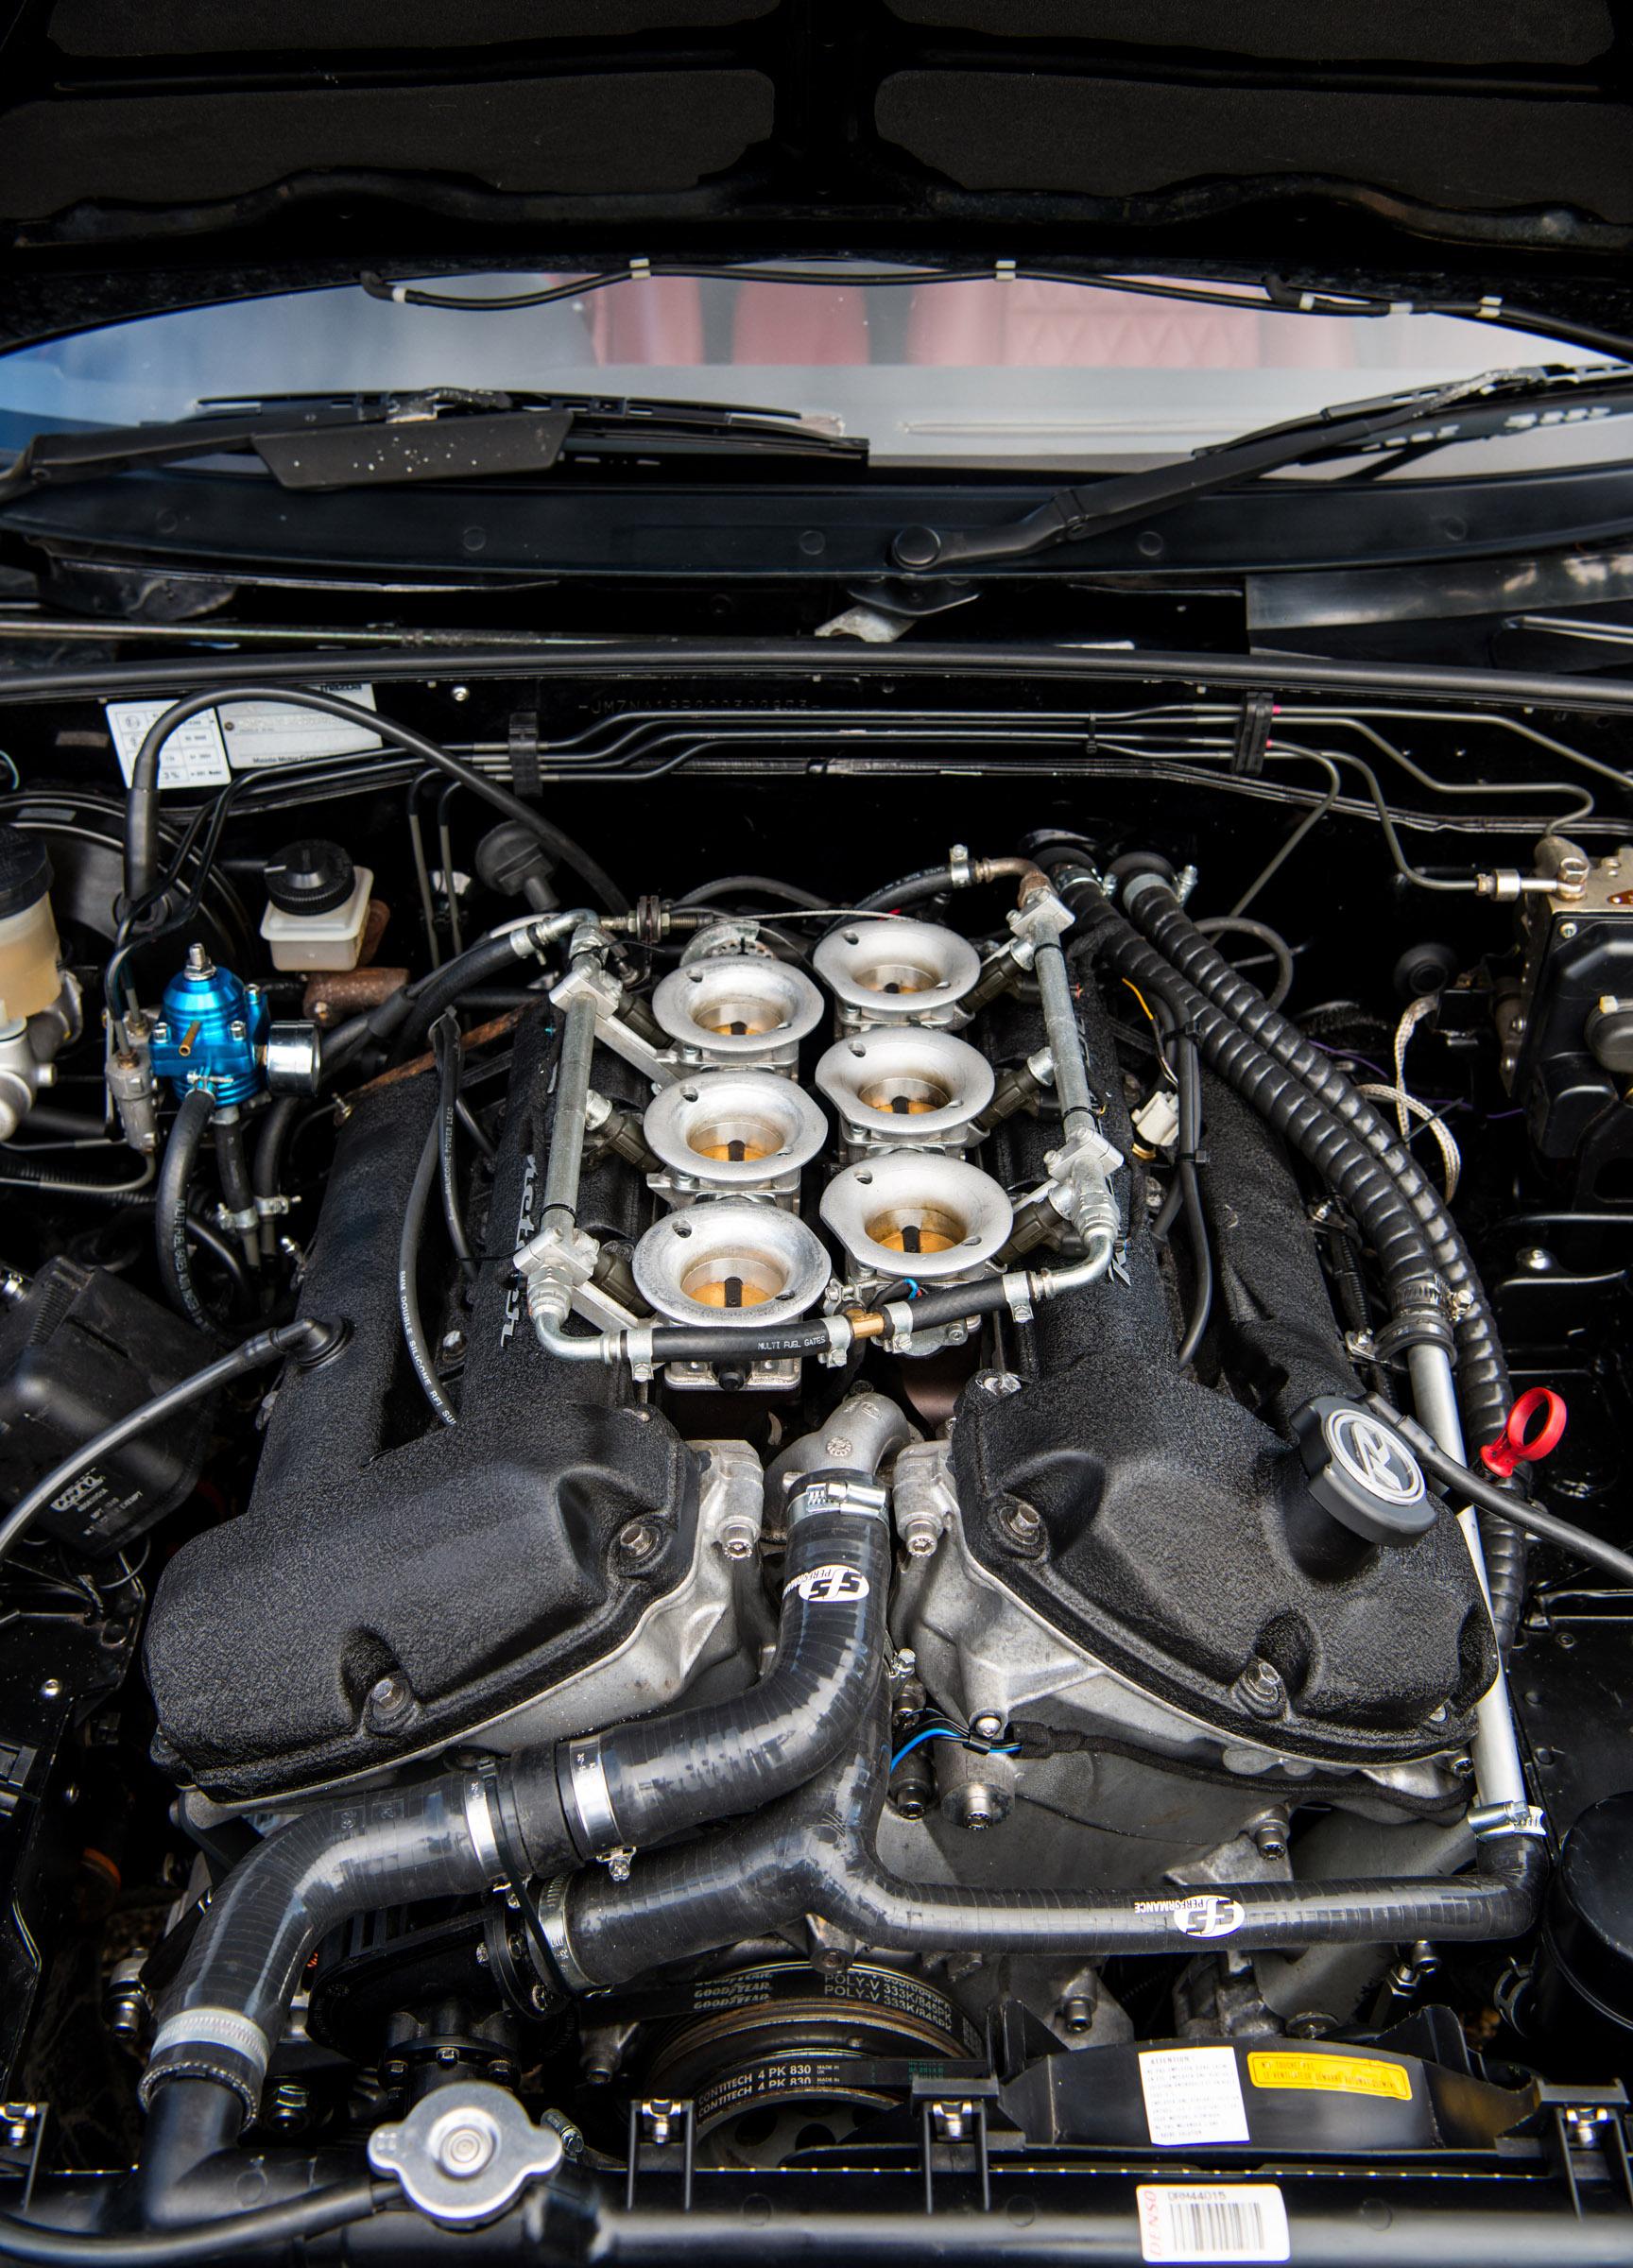 Rocketeer Mazda MX-5 V6 review – big engine and big